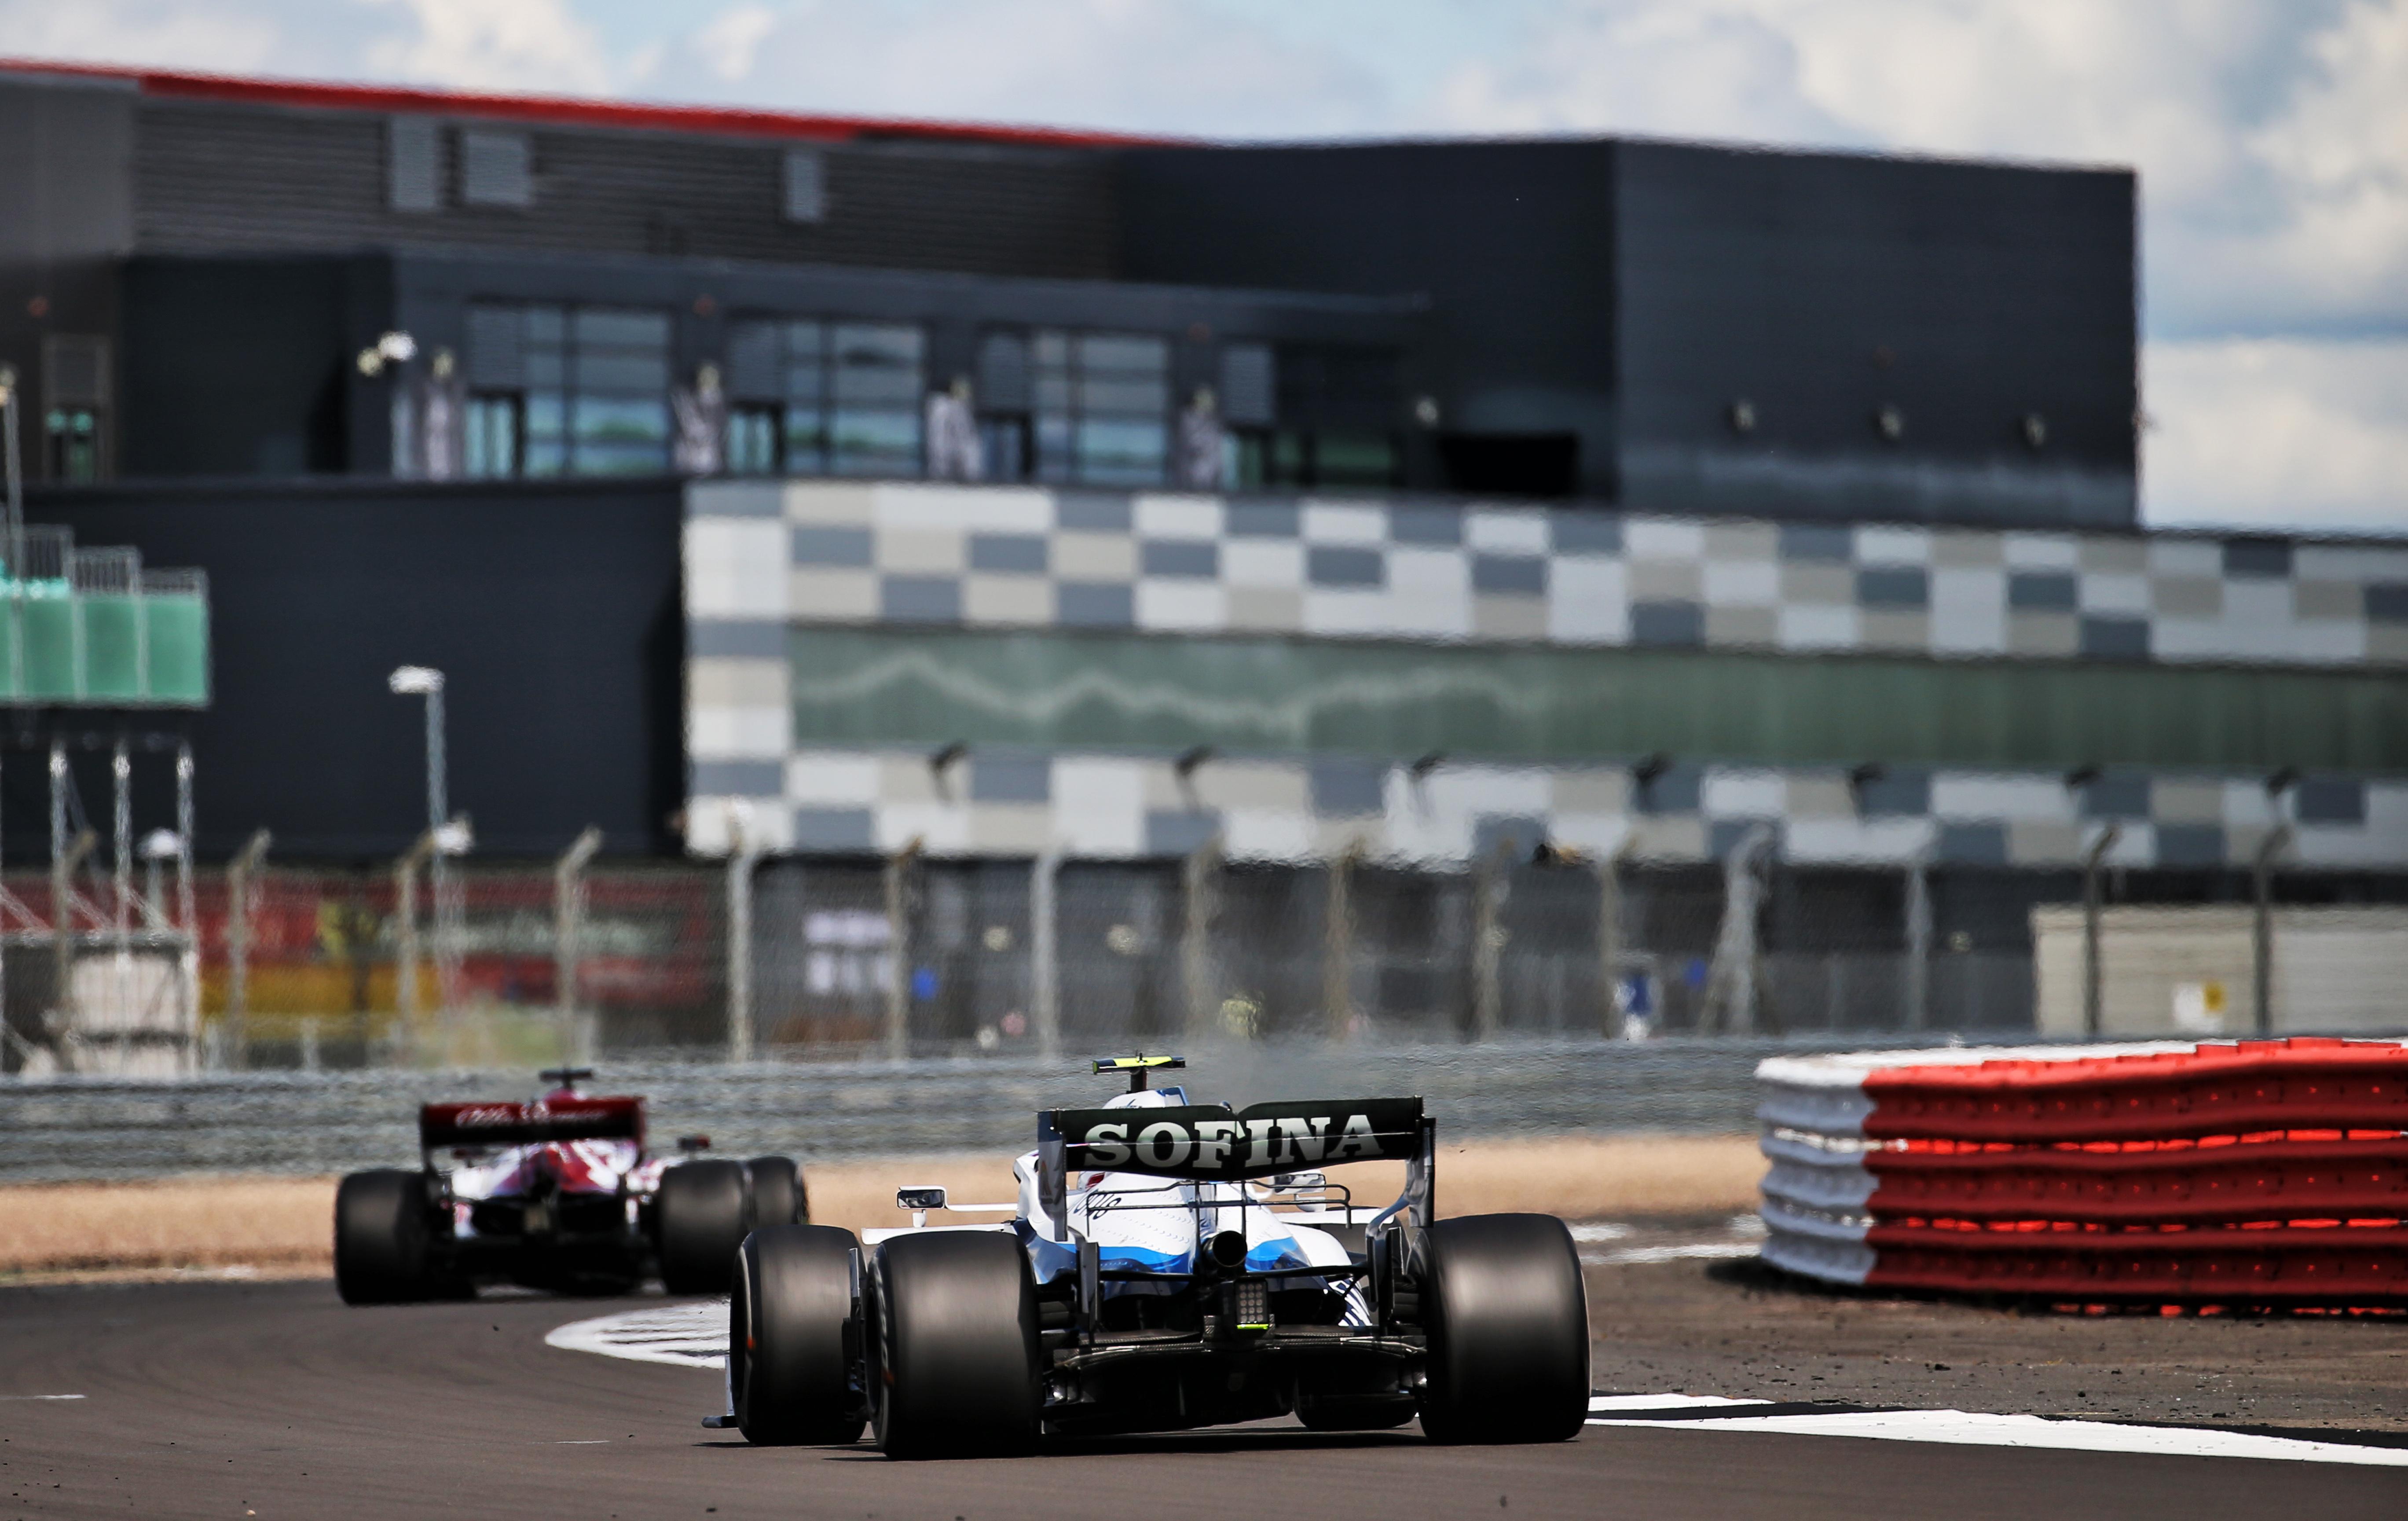 Nicholas Latifi Williams British Grand Prix 2020 Silverstone